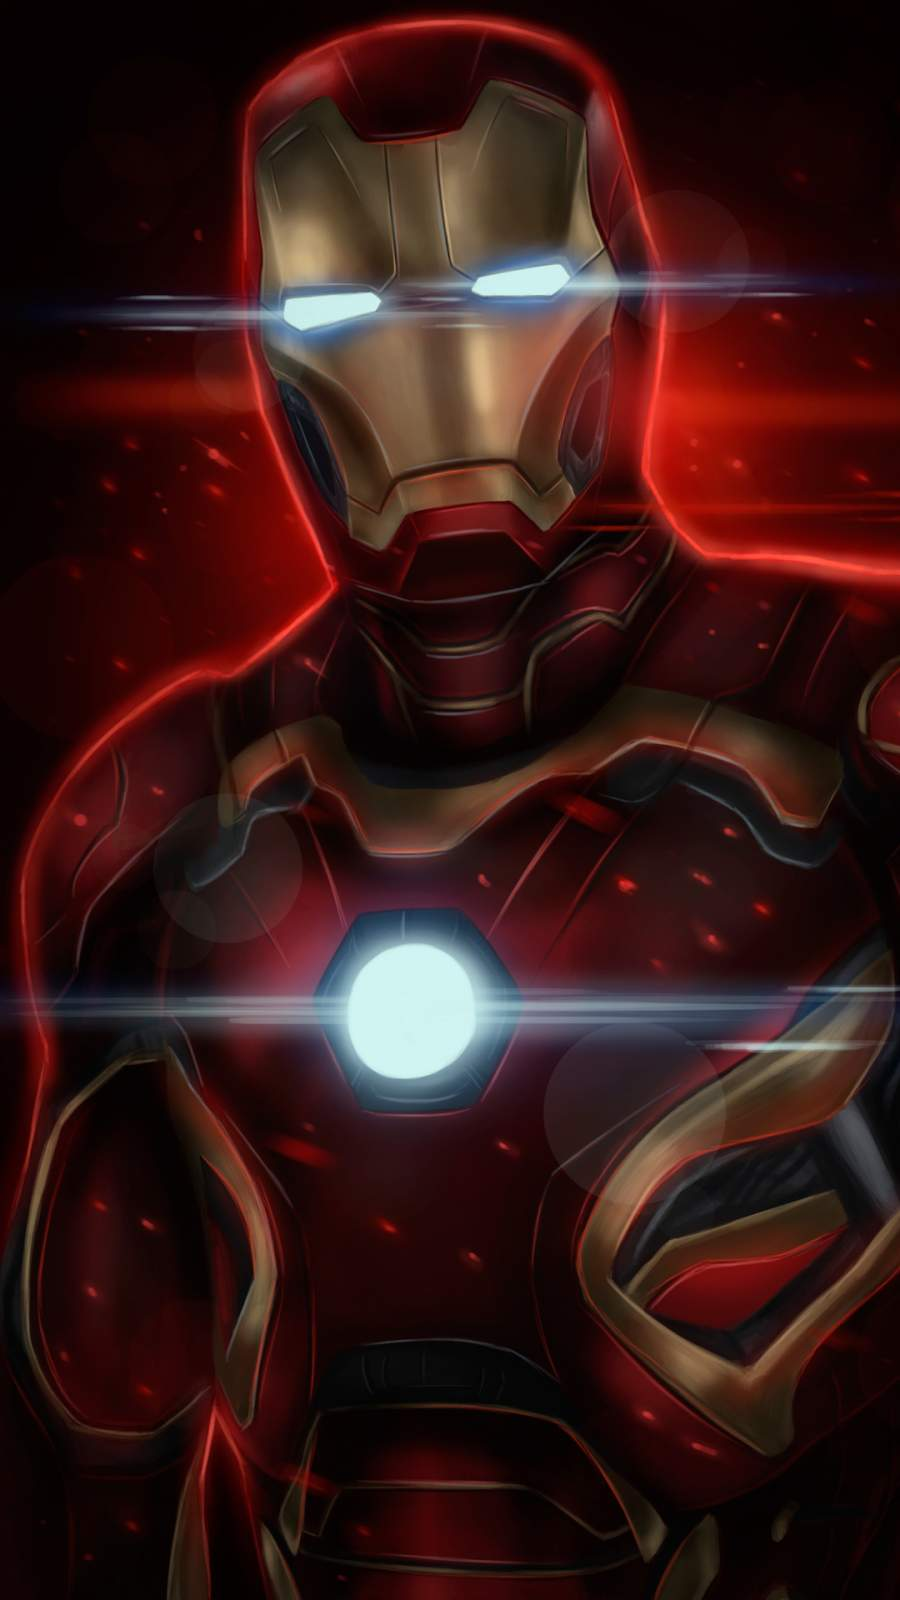 Iron Man Art MK 7 iPhone Wallpaper